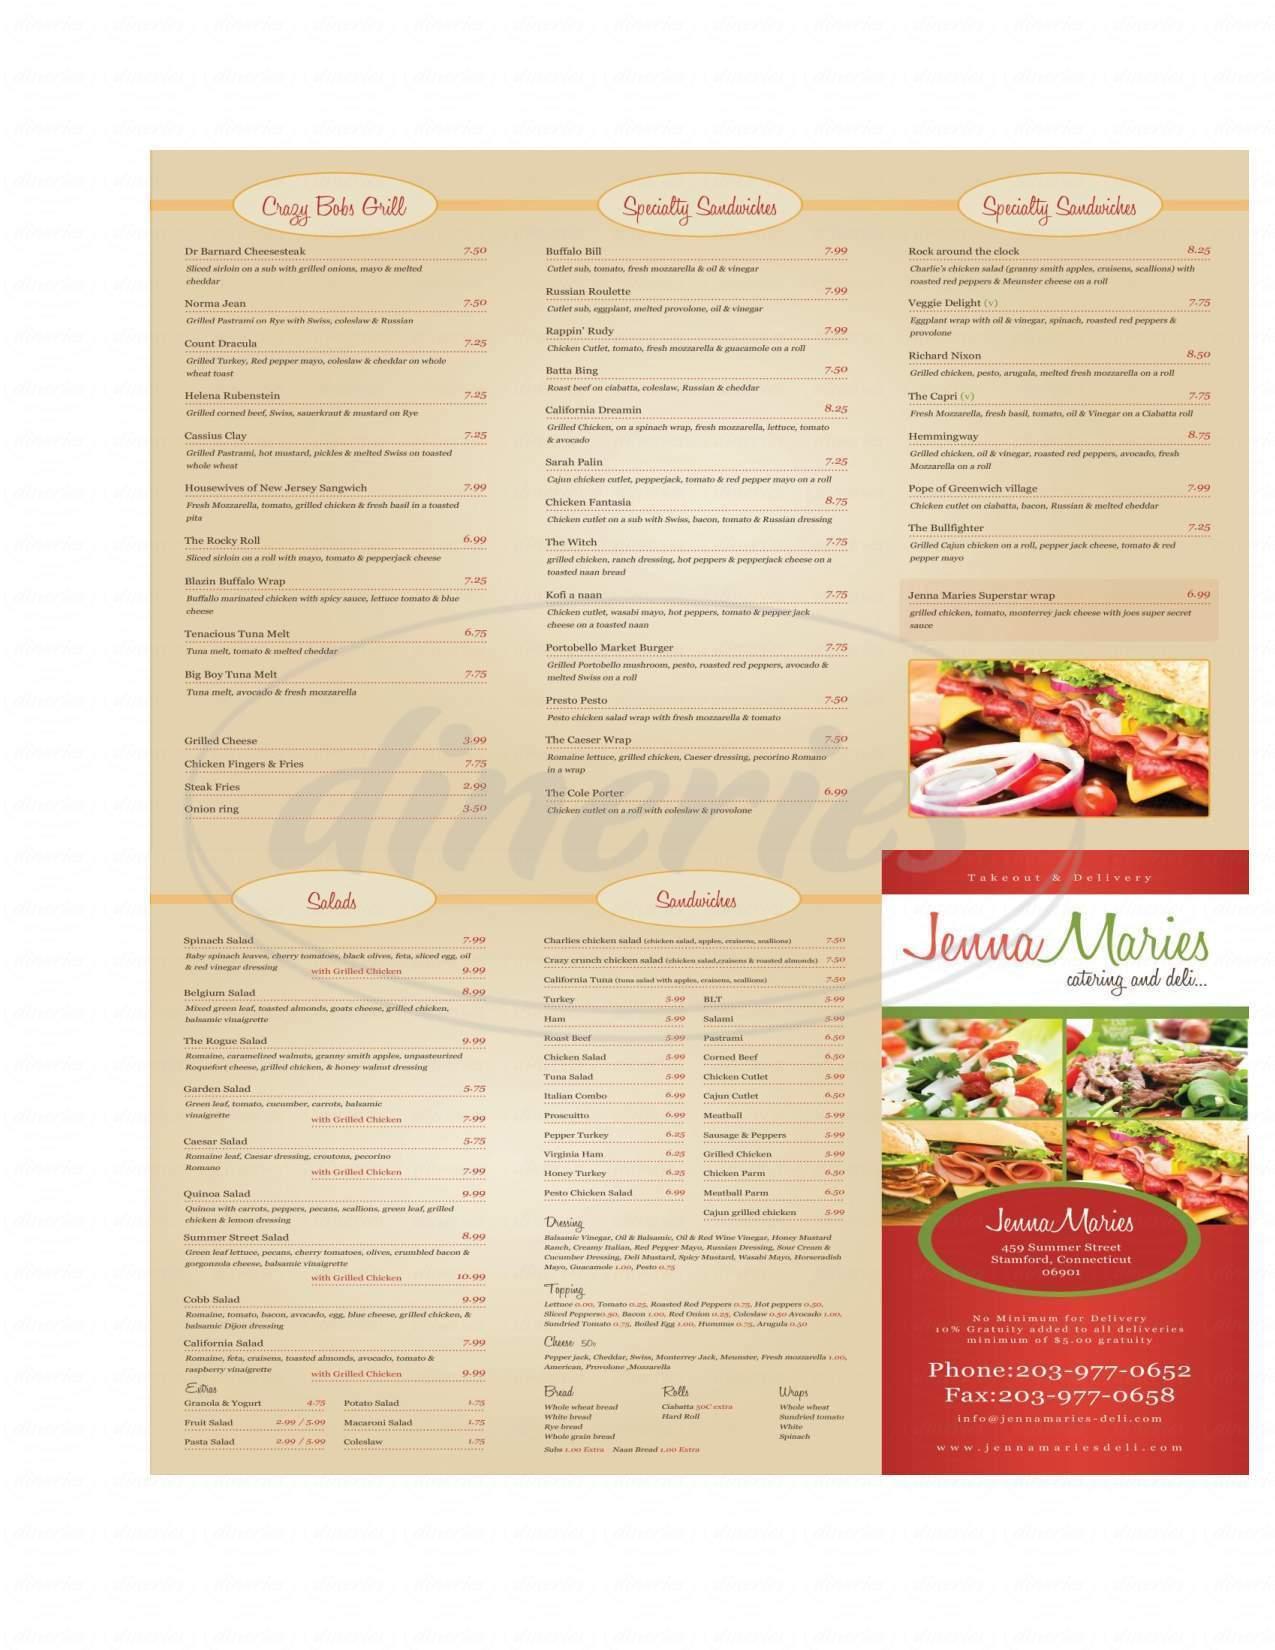 menu for Jenna Marie's Deli